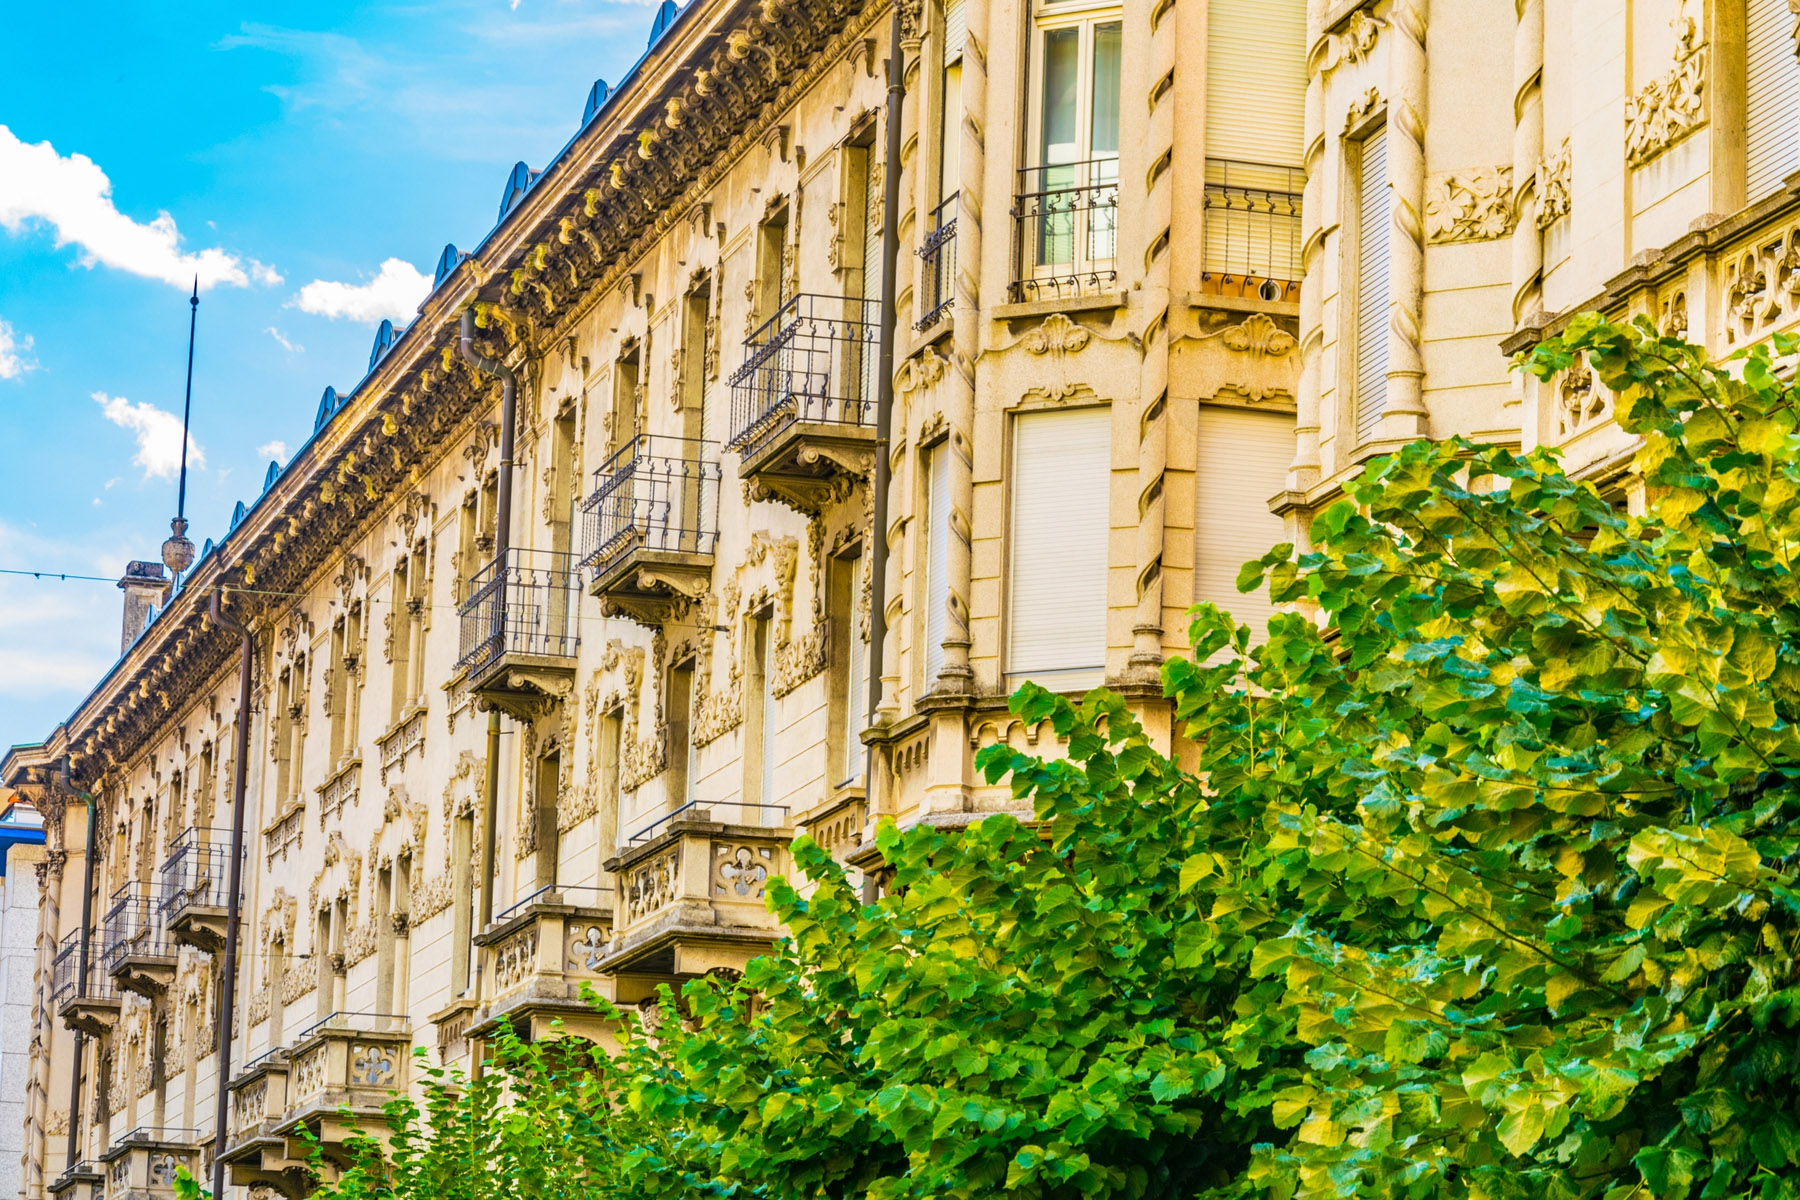 Apartments in Bellinzona